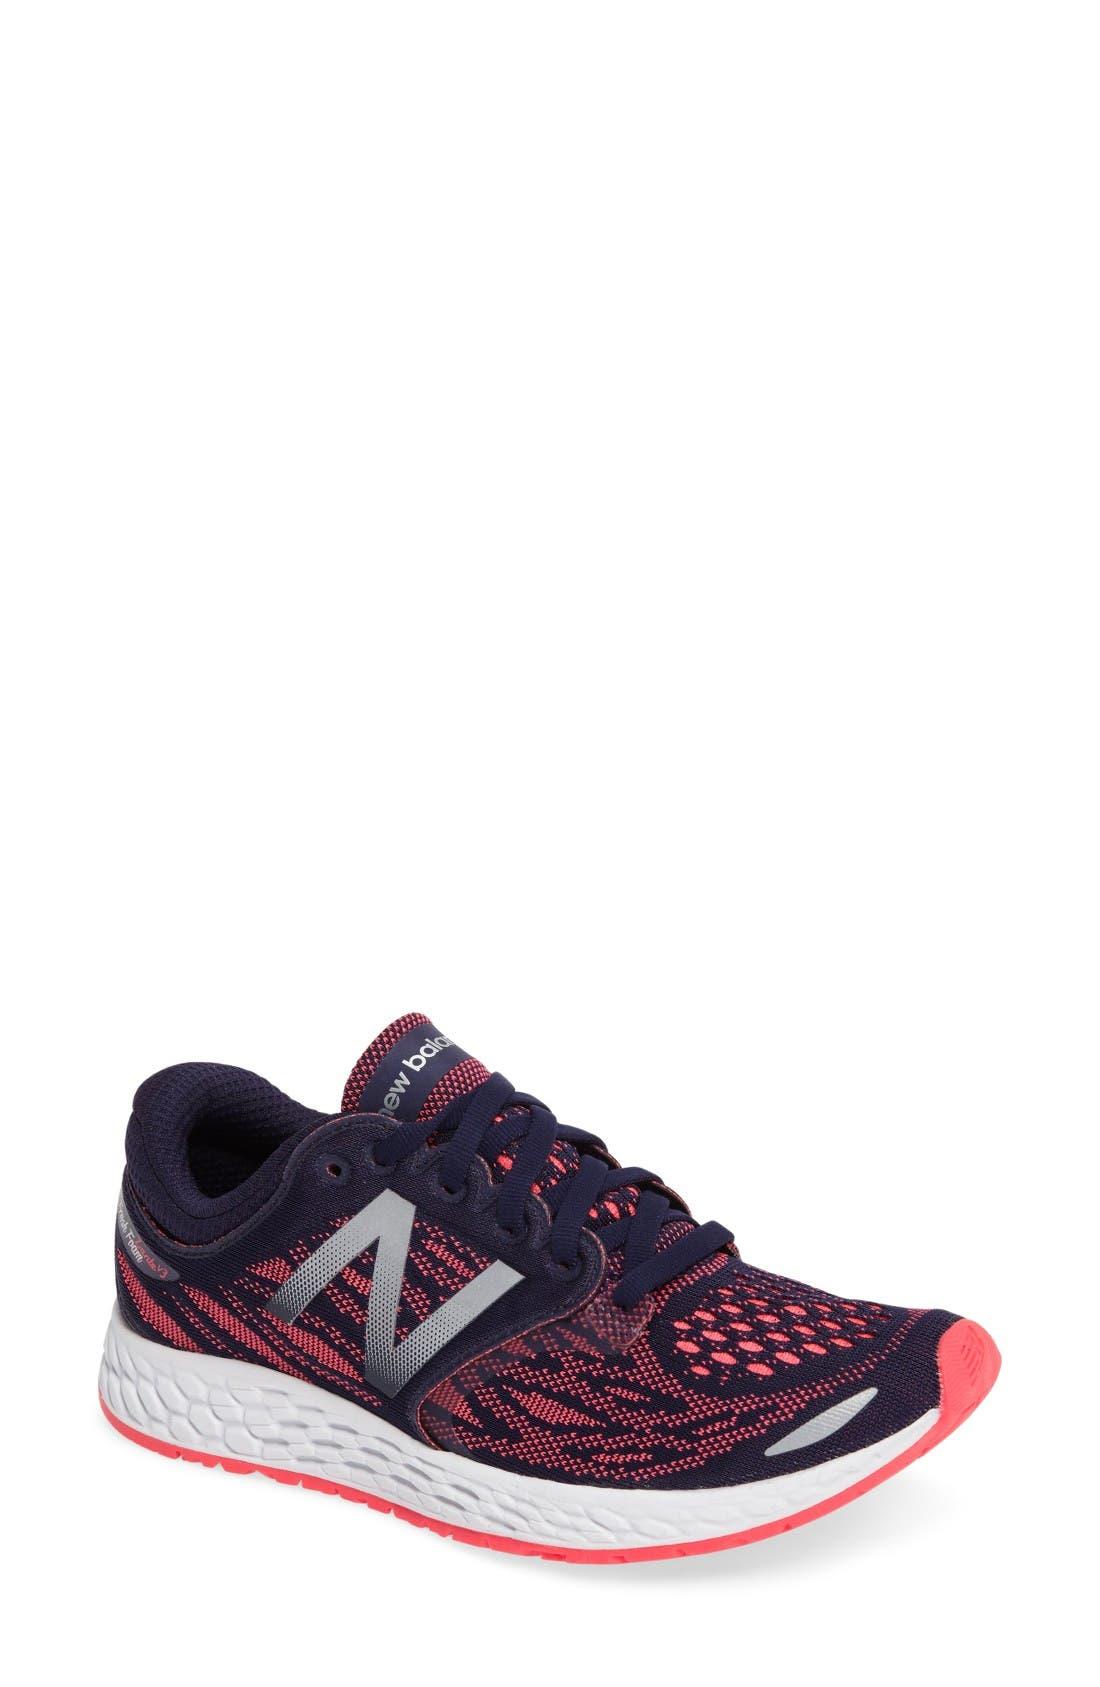 Alternate Image 1 Selected - New Balance Zante V3 Running Shoe (Women)